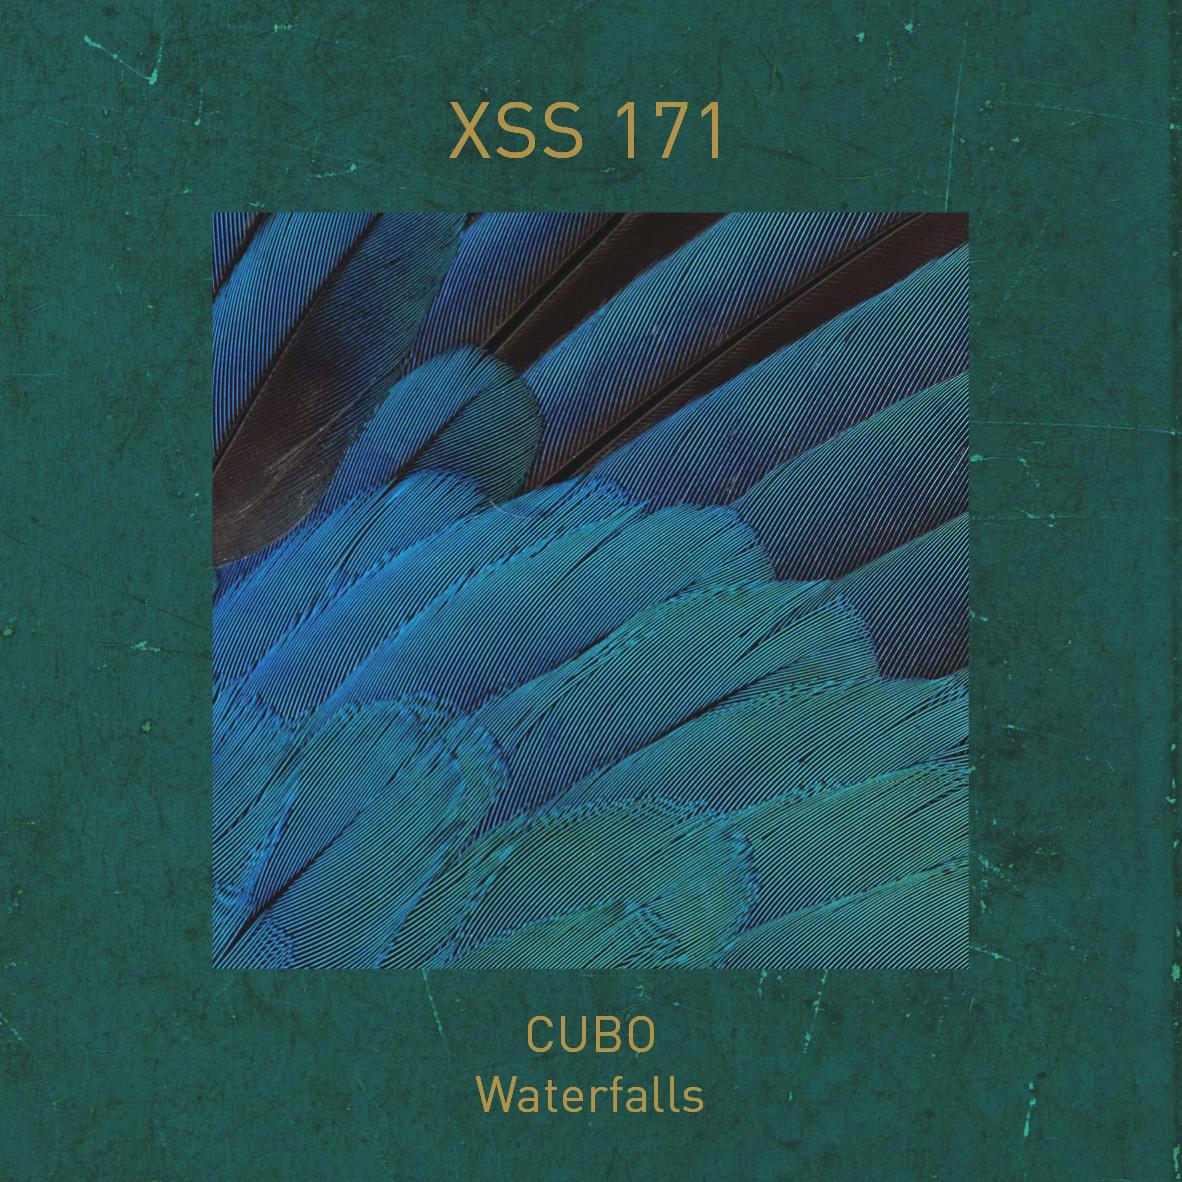 XSS171 | Cubo | Waterfalls